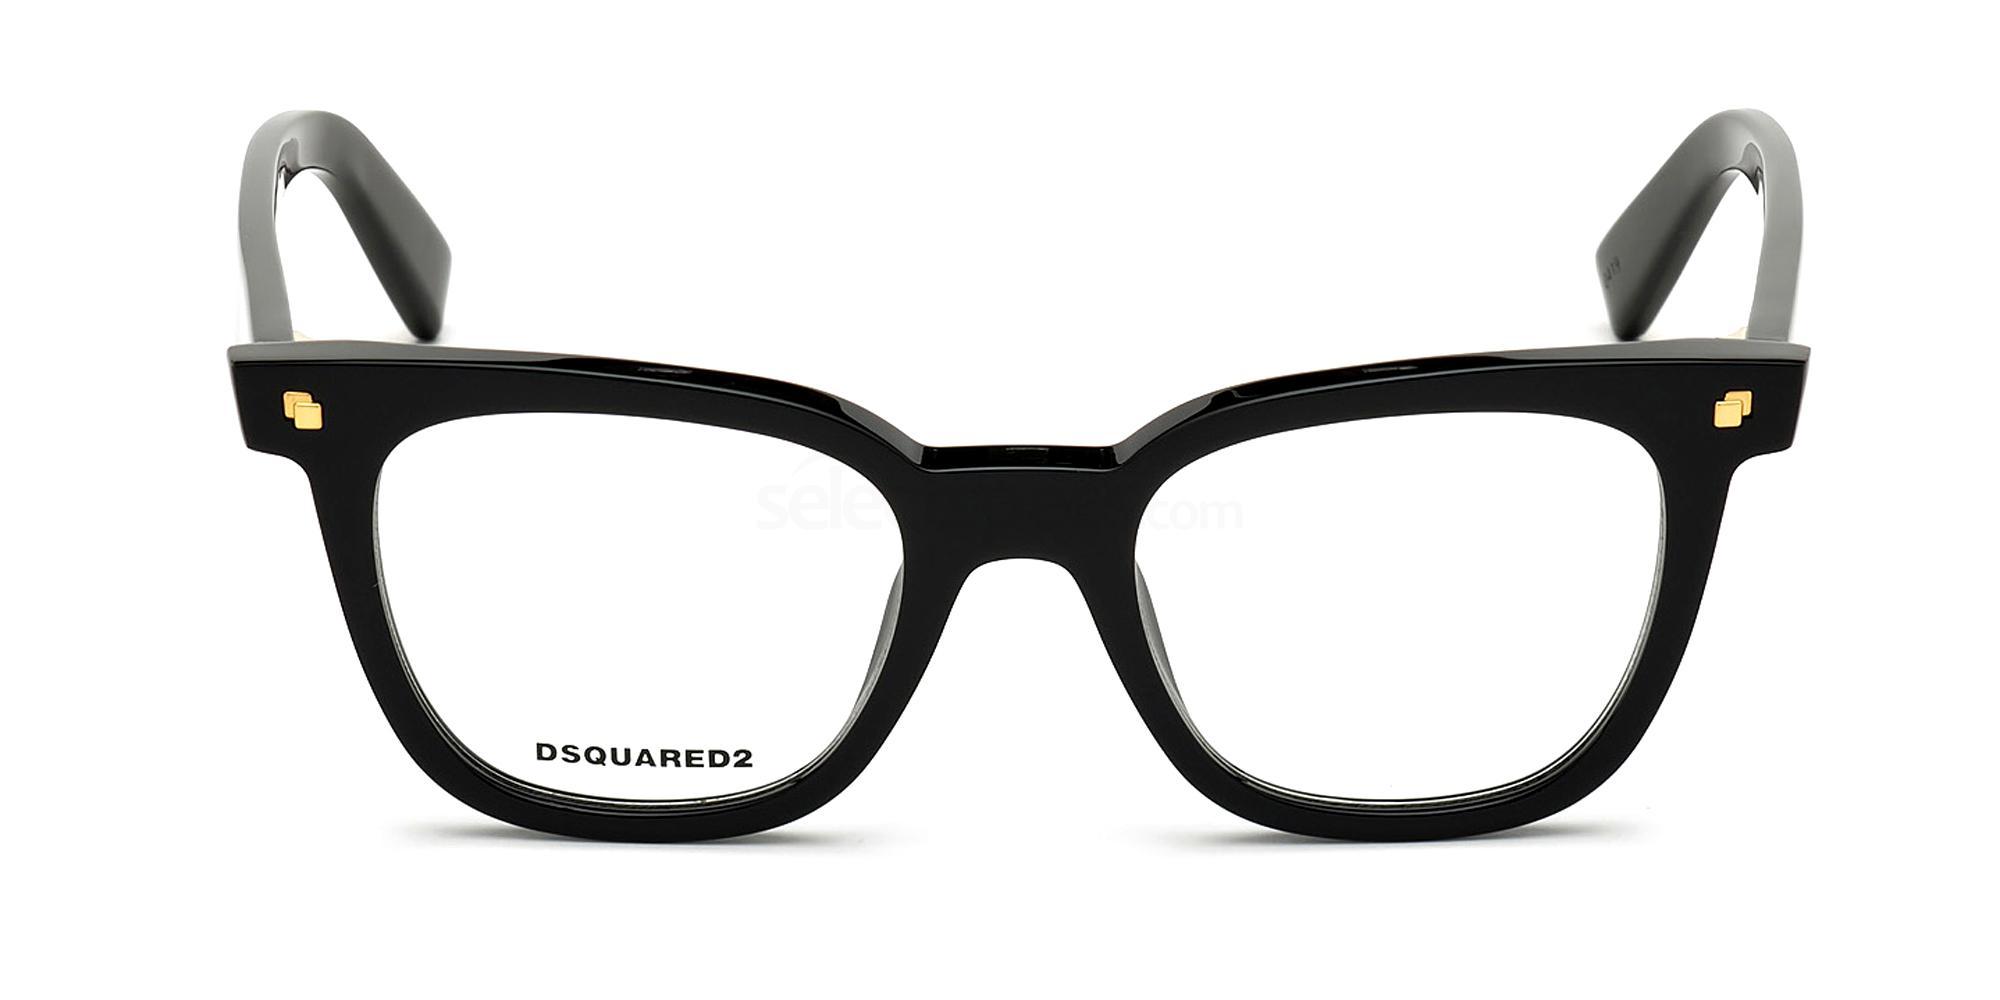 001 DQ5307 Glasses, DSQUARED2